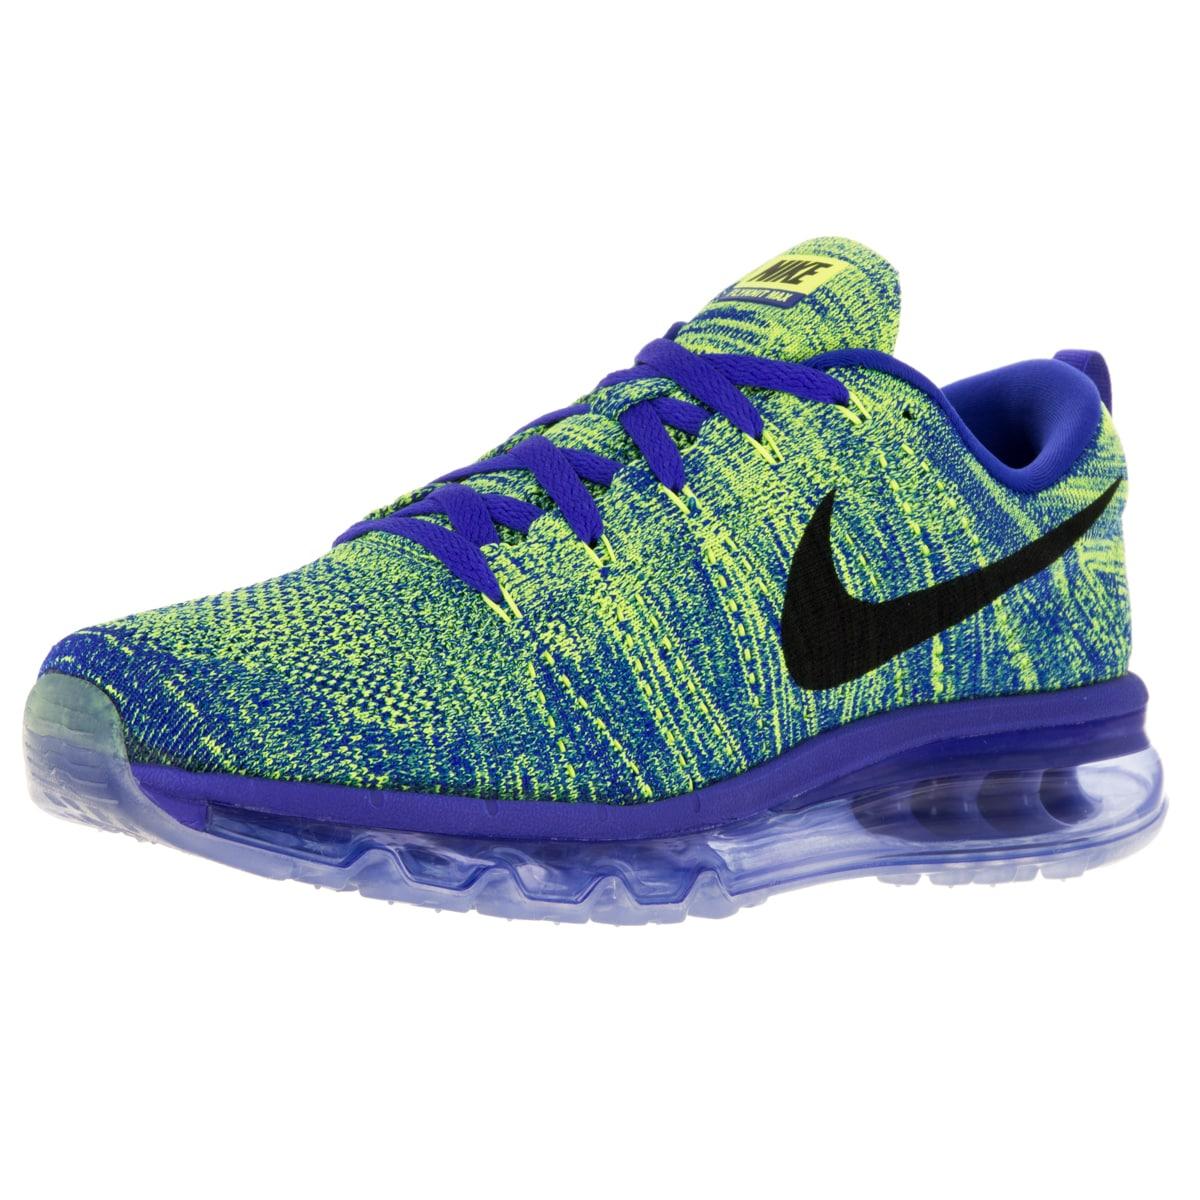 sale retailer b89e7 efd90 Shop Nike Men s Flyknit Max Racer Blue Mesh Running Shoe - Free Shipping  Today - Overstock - 12115529